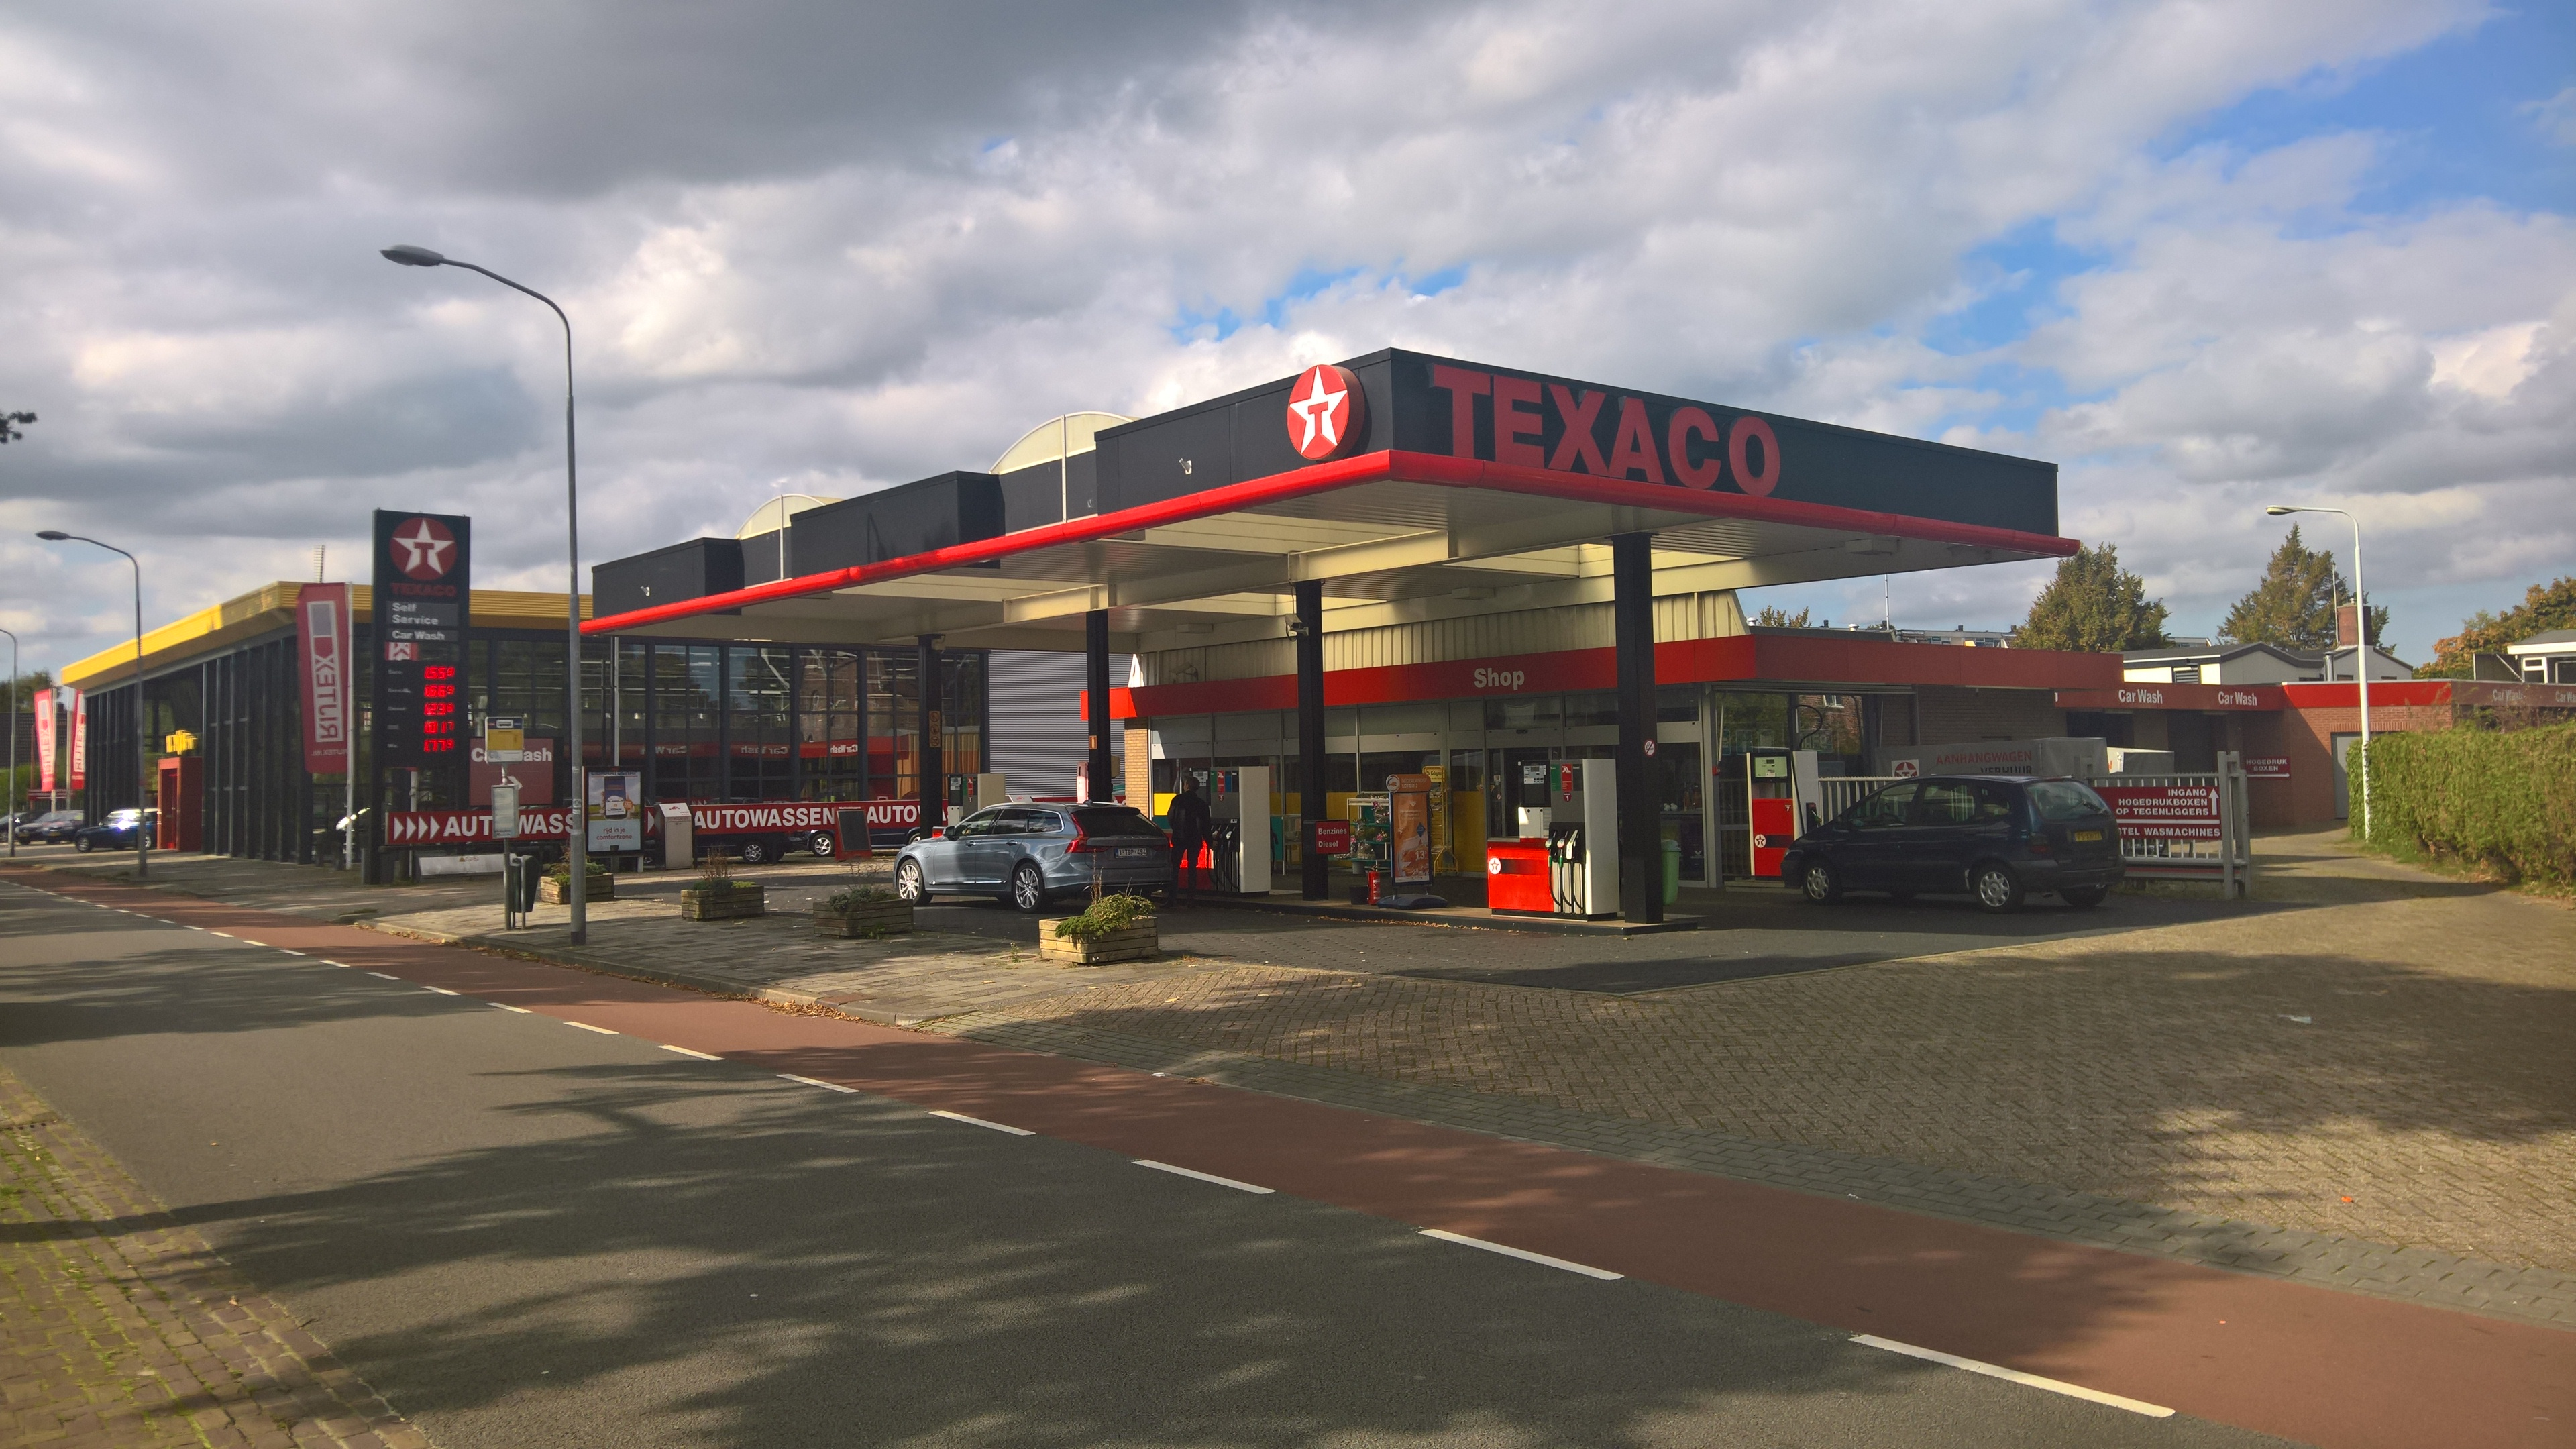 File:Texaco gas station, Winschoten (2017) 02 jpg